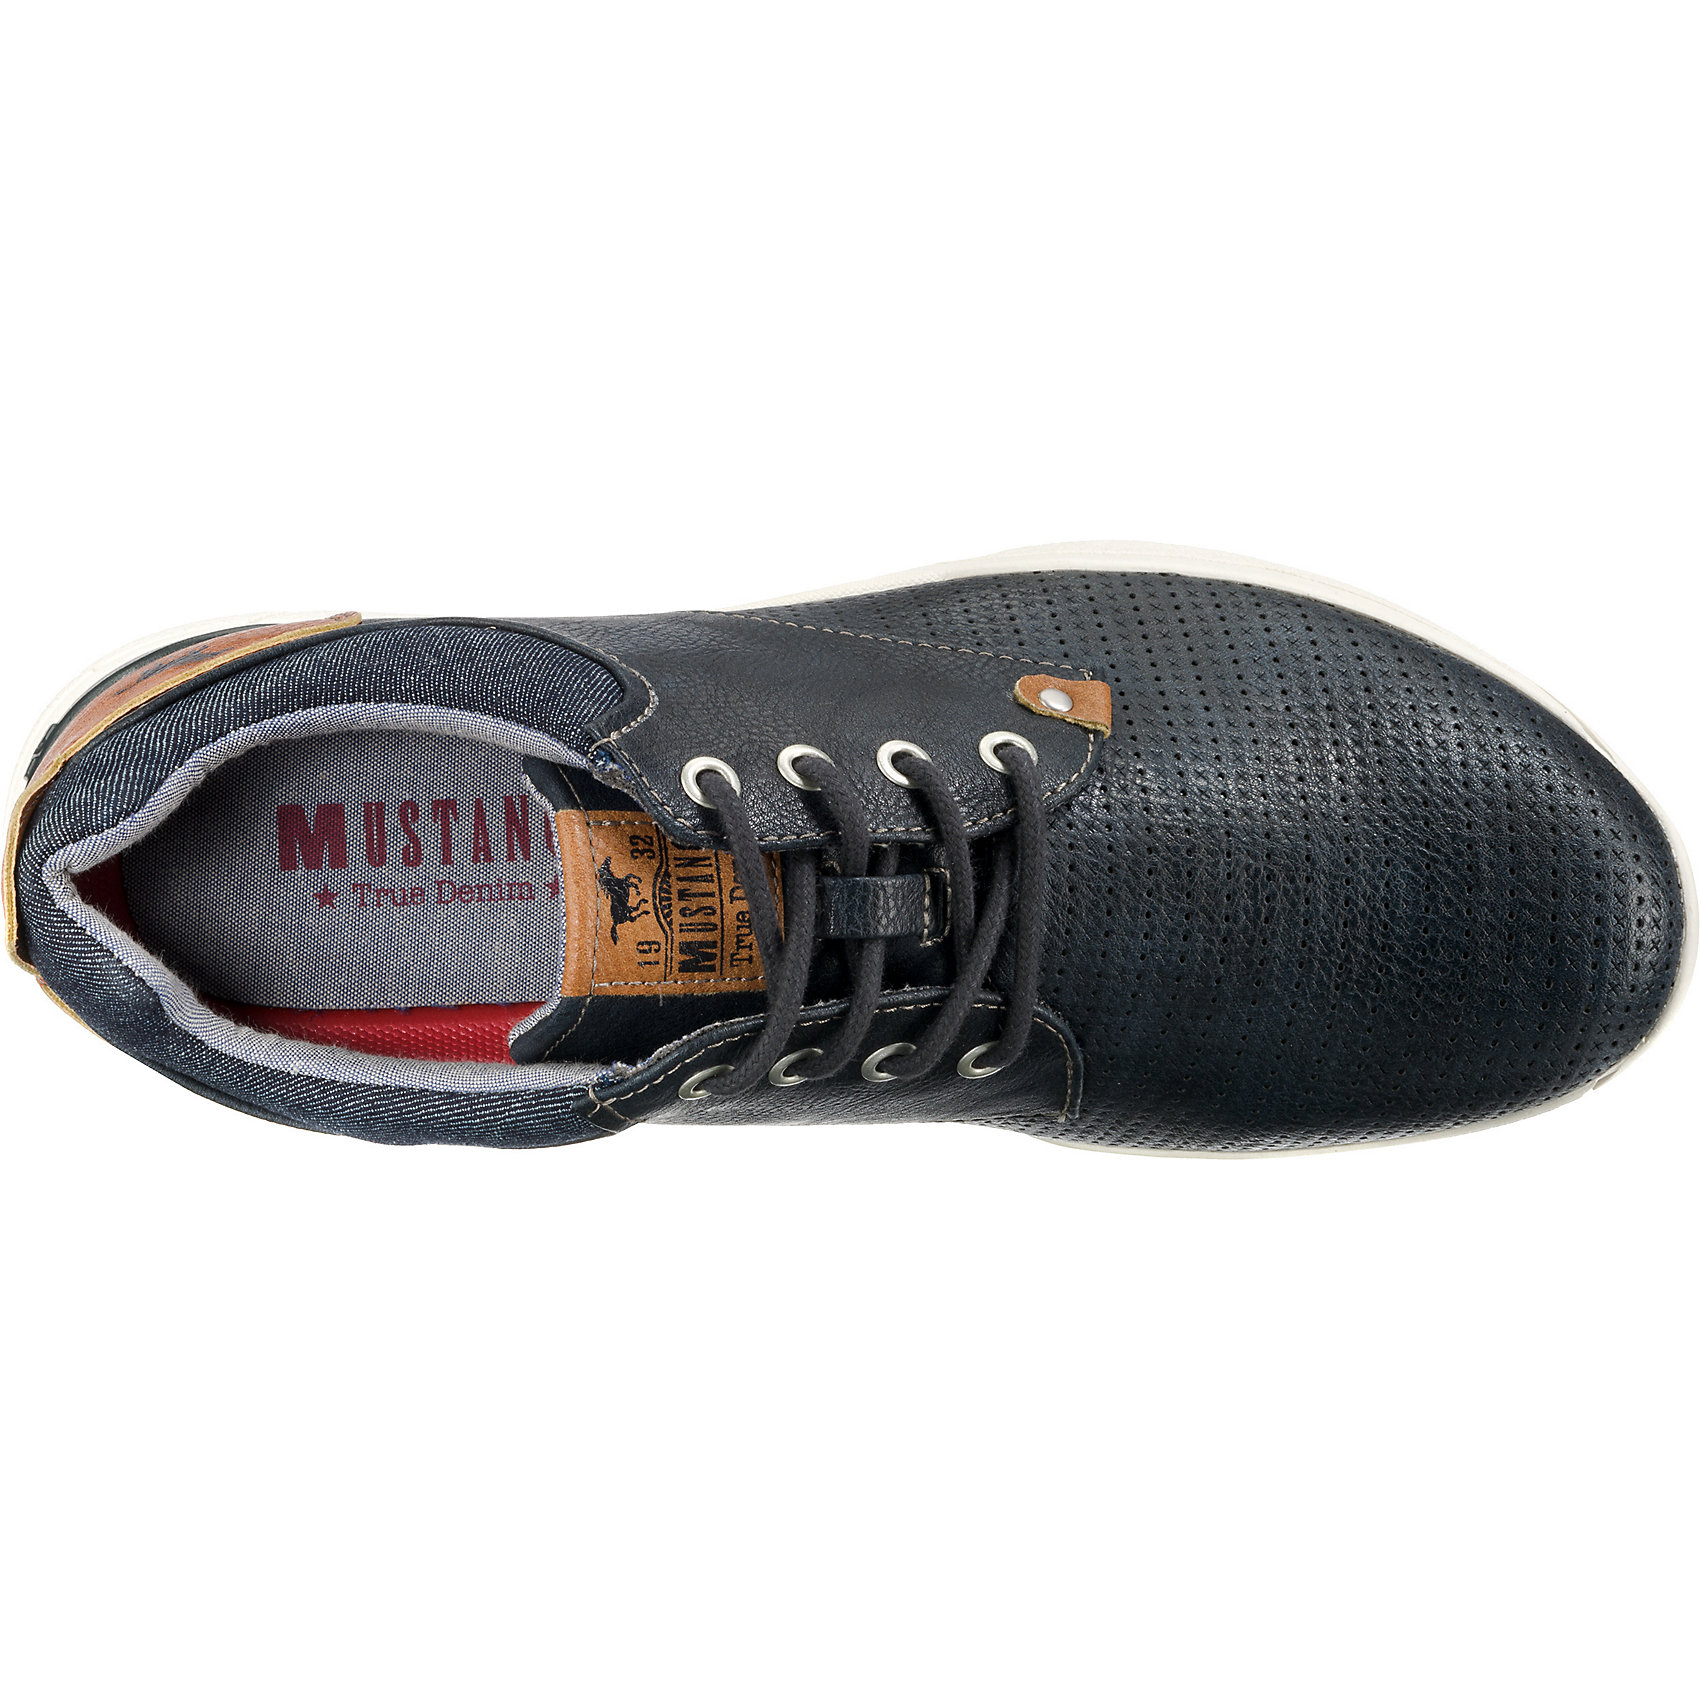 Für Mustang Herren Sneakers Dunkelblau 10738821 Neu Low Grau wIxRC4Rqd